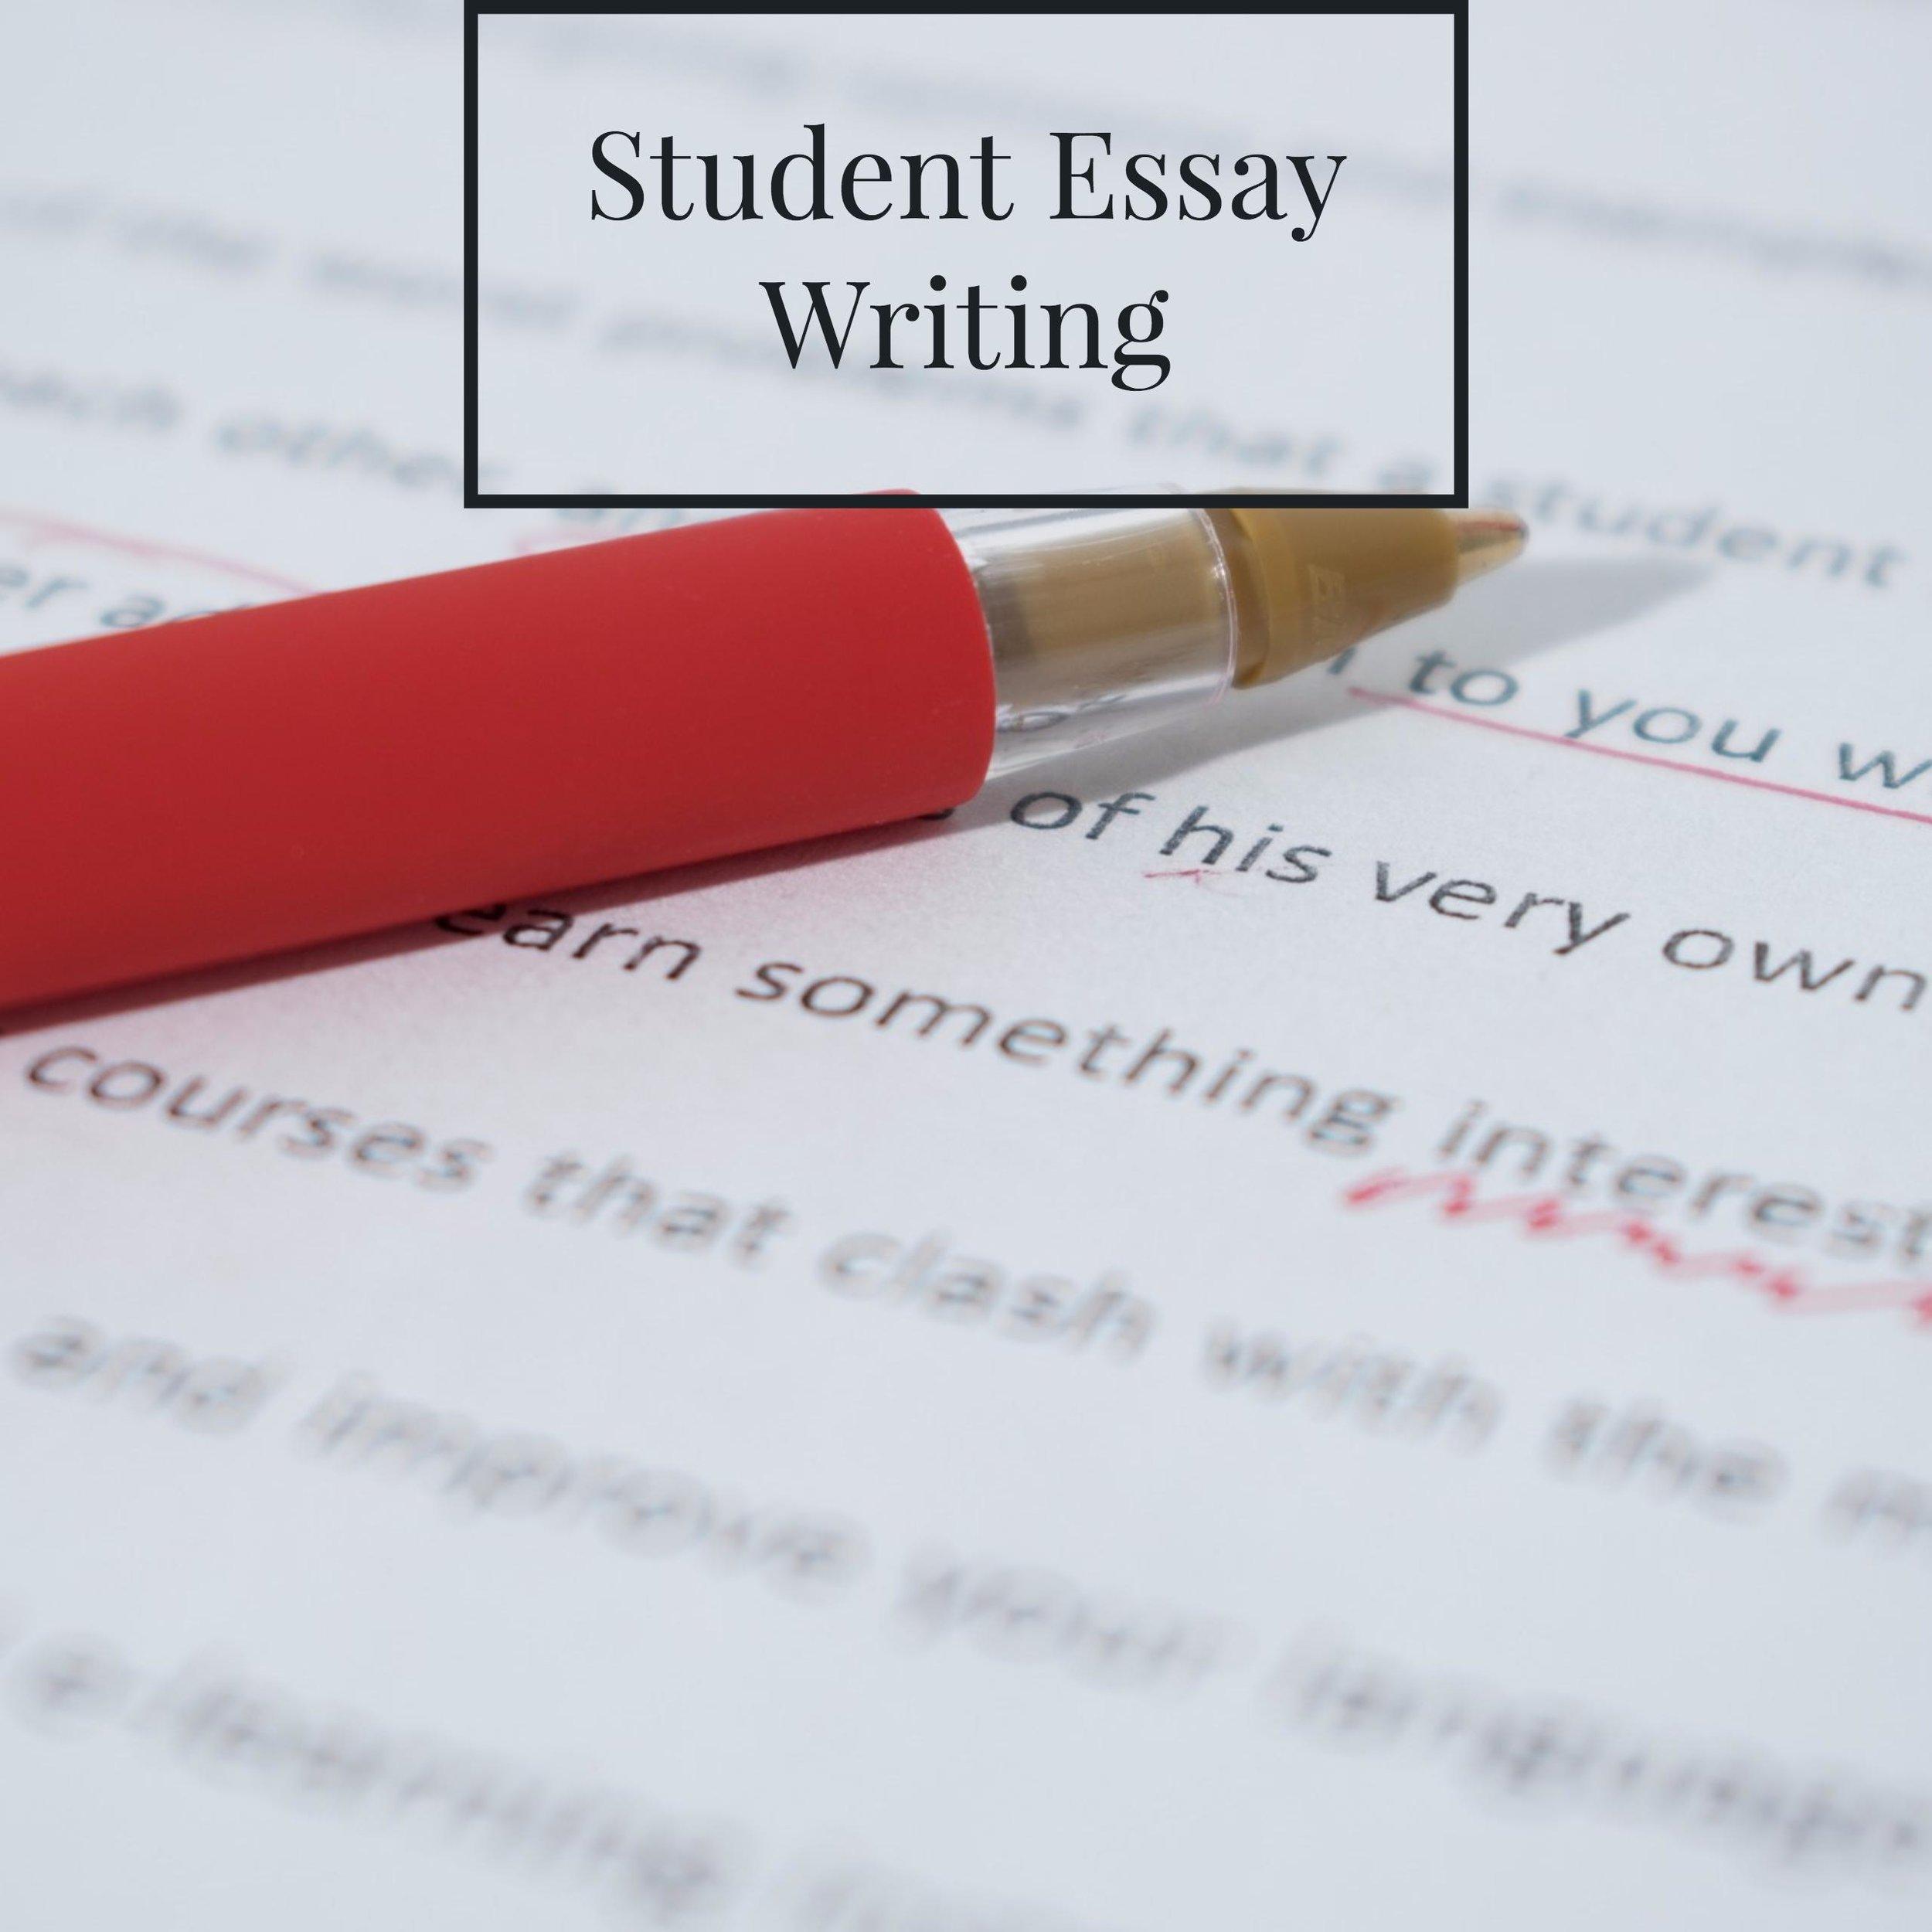 Student Essay Writing.jpg